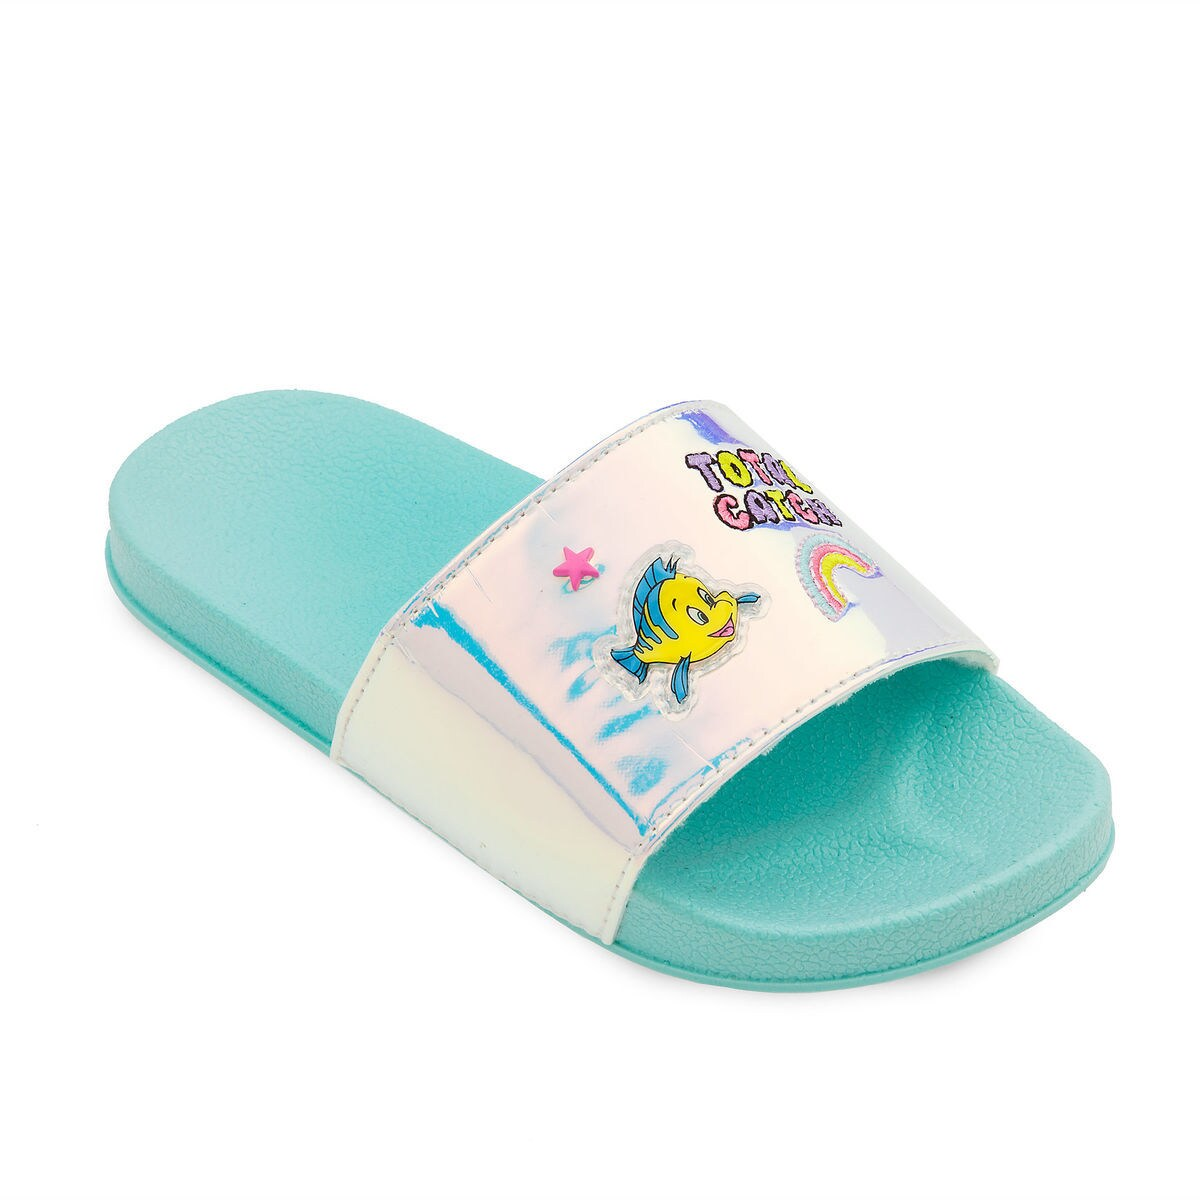 e71eda3ce228c4 Thumbnail Image of Ariel and Flounder Slides for Kids   1